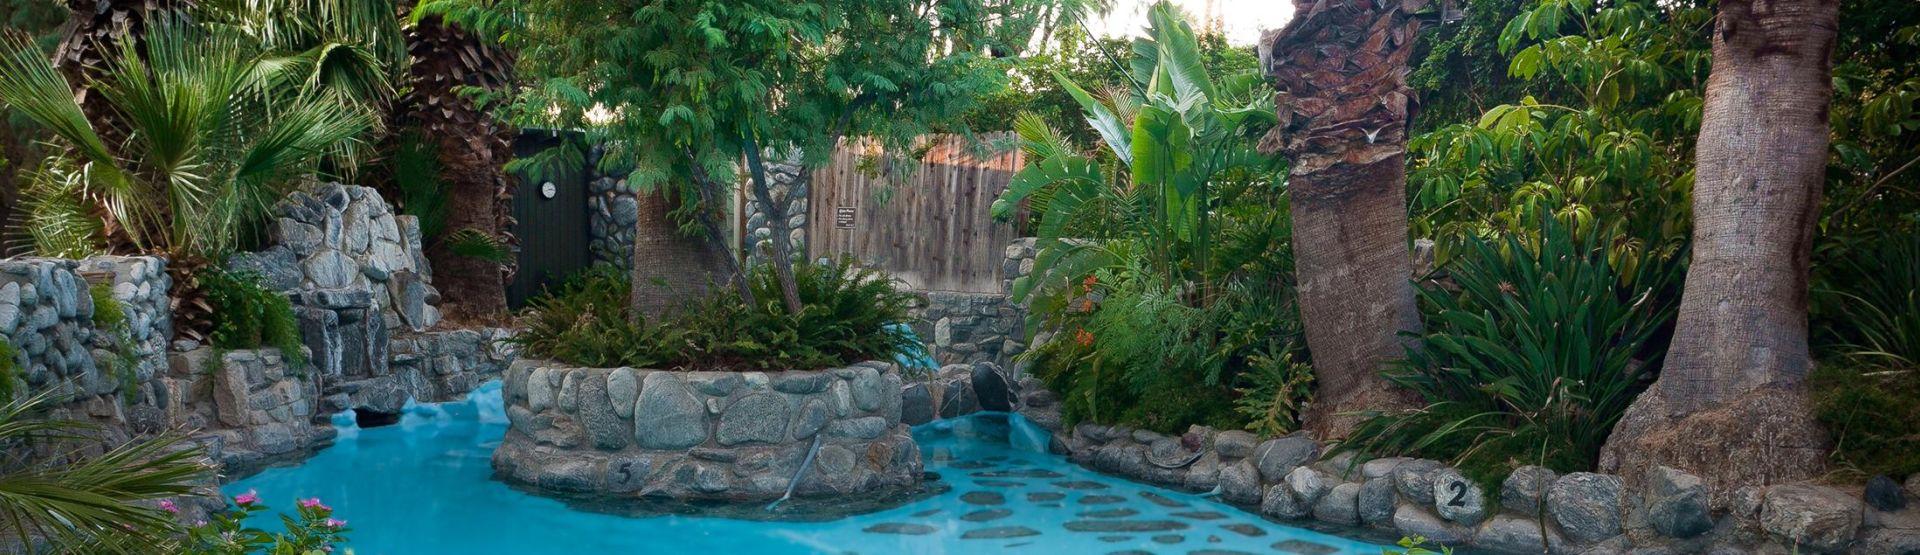 Explore Desert Hot Springs Ca A Greater Palm Springs